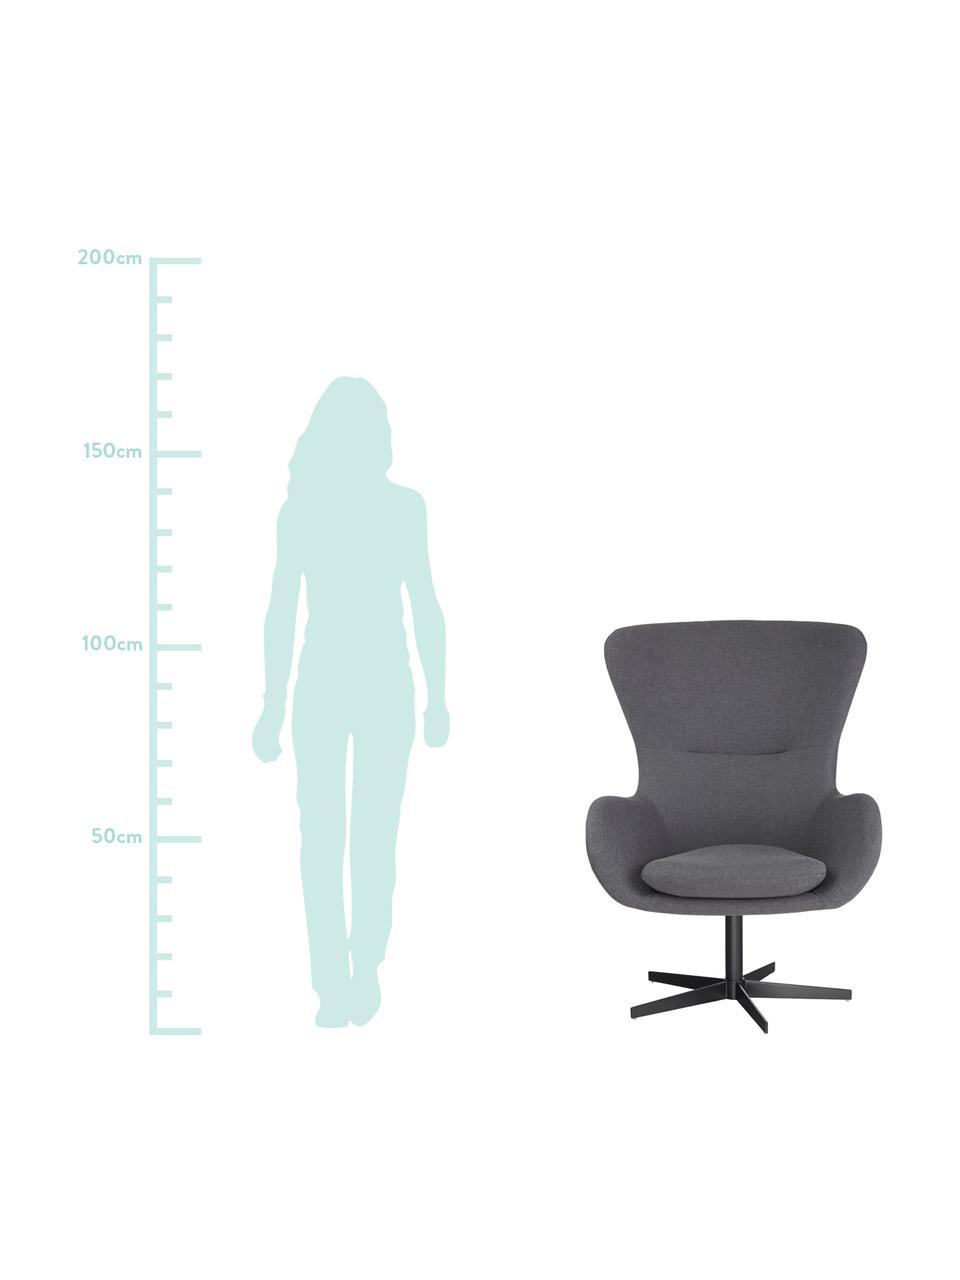 Ohrensessel Wing in Grau, drehbar, Bezug: 93% Polyester, 5% Baumwol, Füße: Metall, pulverbeschichtet, Webstoff Grau, B 76 x T 77 cm